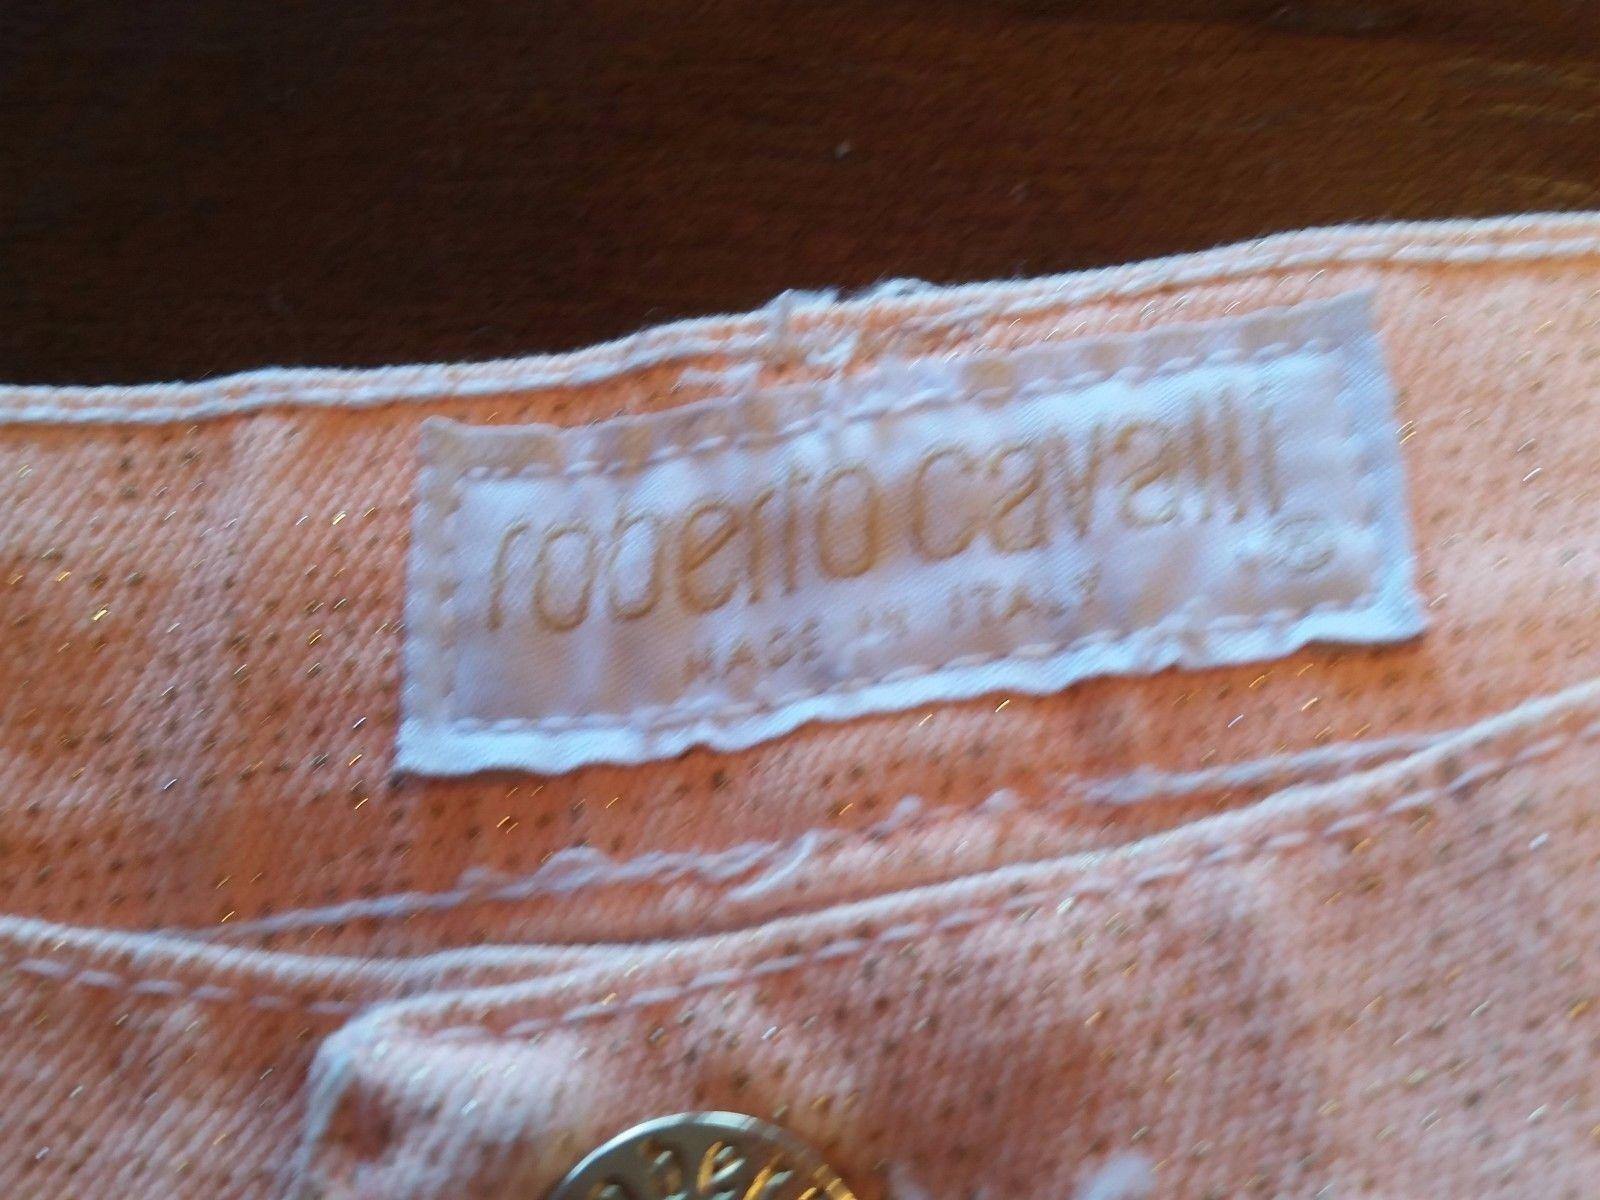 Roberto Cavalli Hand Painted Designer Jeans